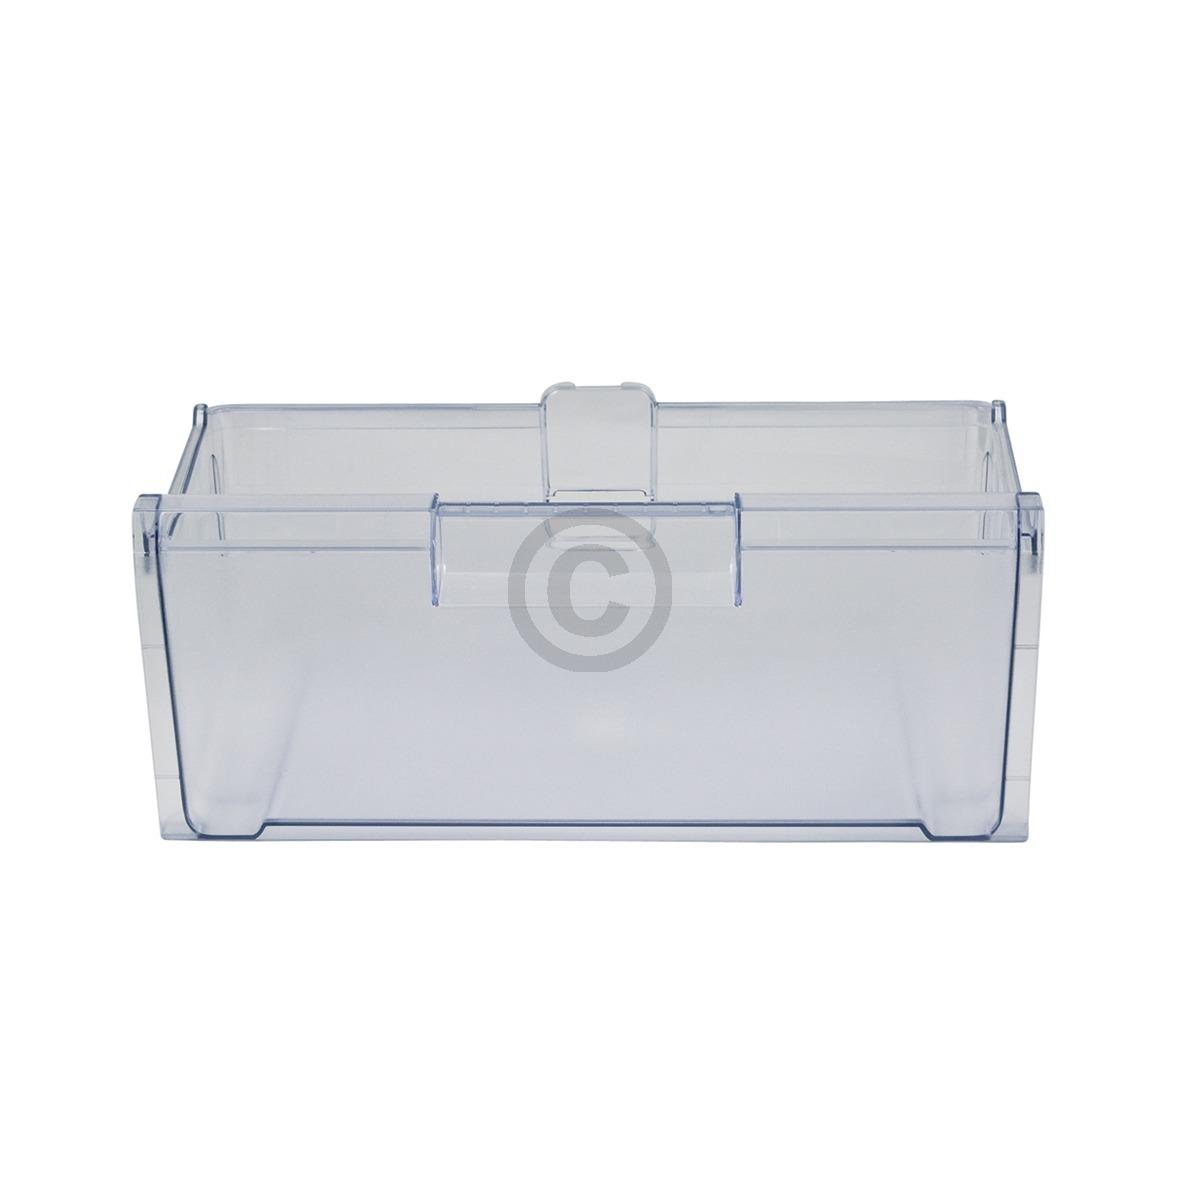 Schublade Bosch 00358825 Gefriergutbehälter 472x199x216mm